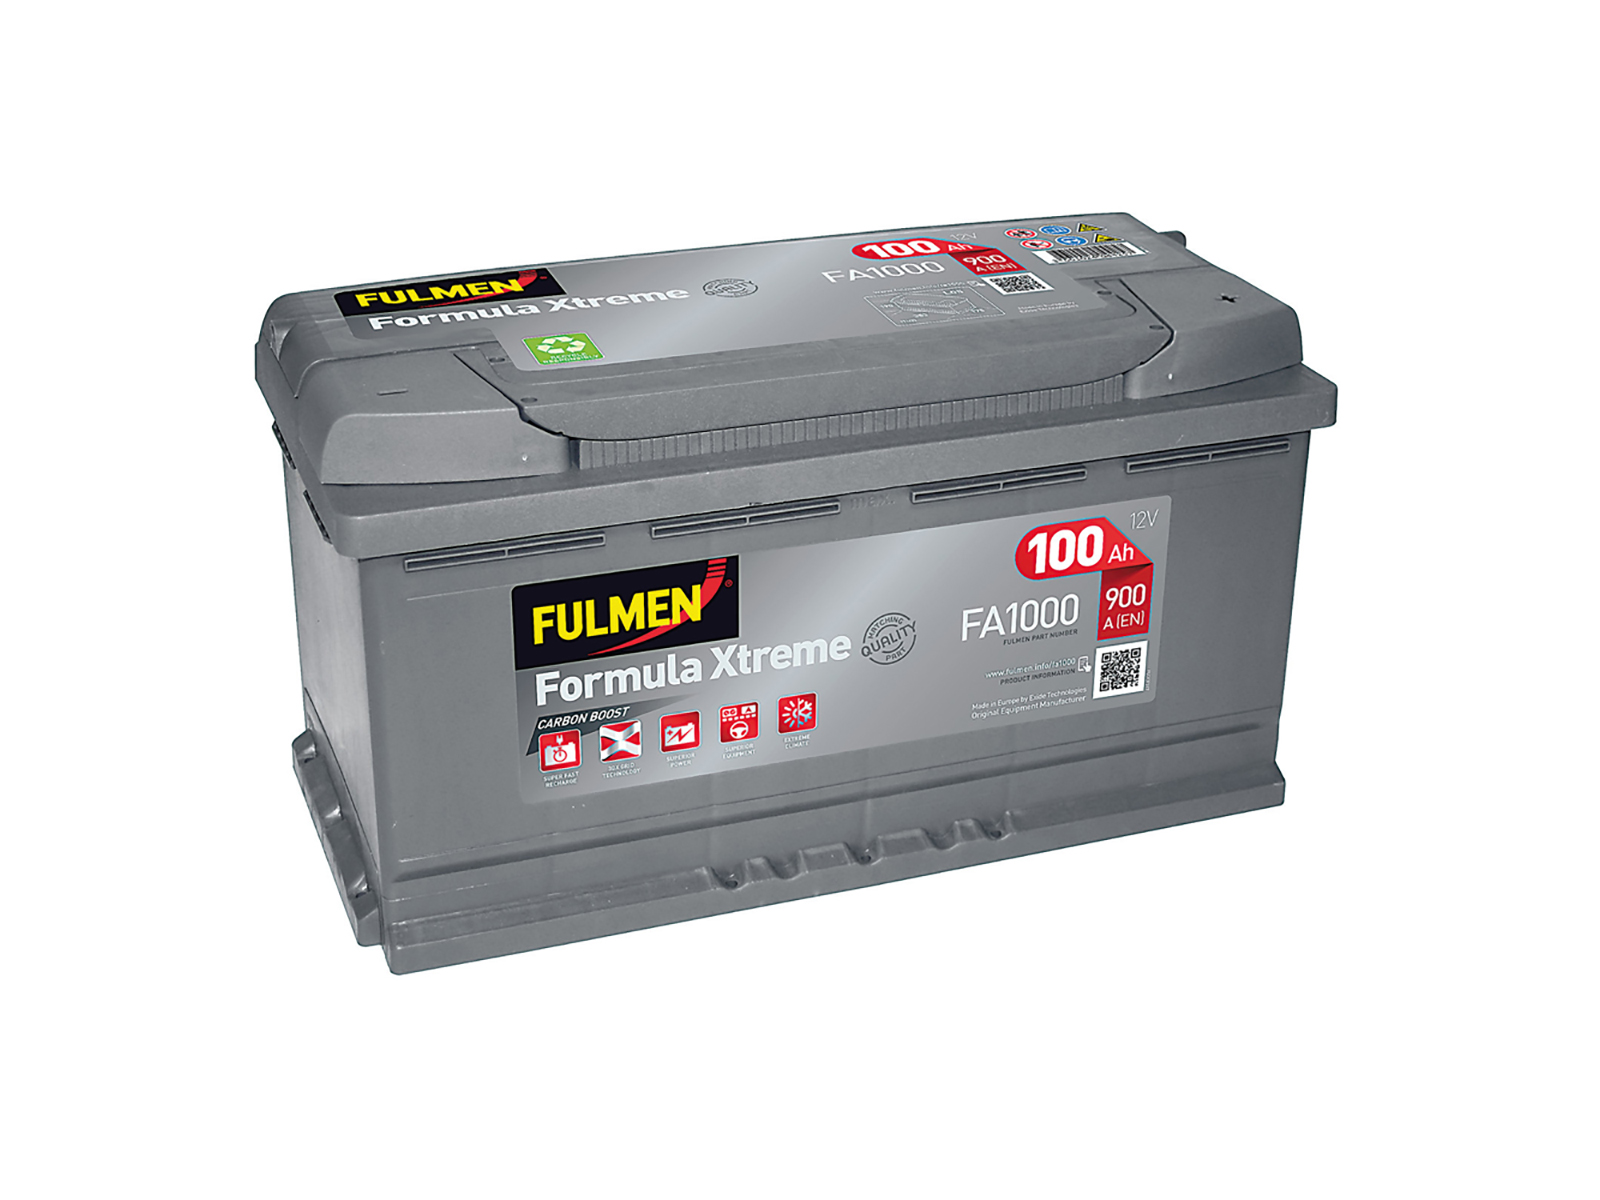 Iveco DAILY III versiones batería 35 C 10 V - 35 S 10 V - 35 C 12 V - 35 S 12 V - 35 C 15 Diesel año 11-01 04-06 12 V 12 V 100 AH